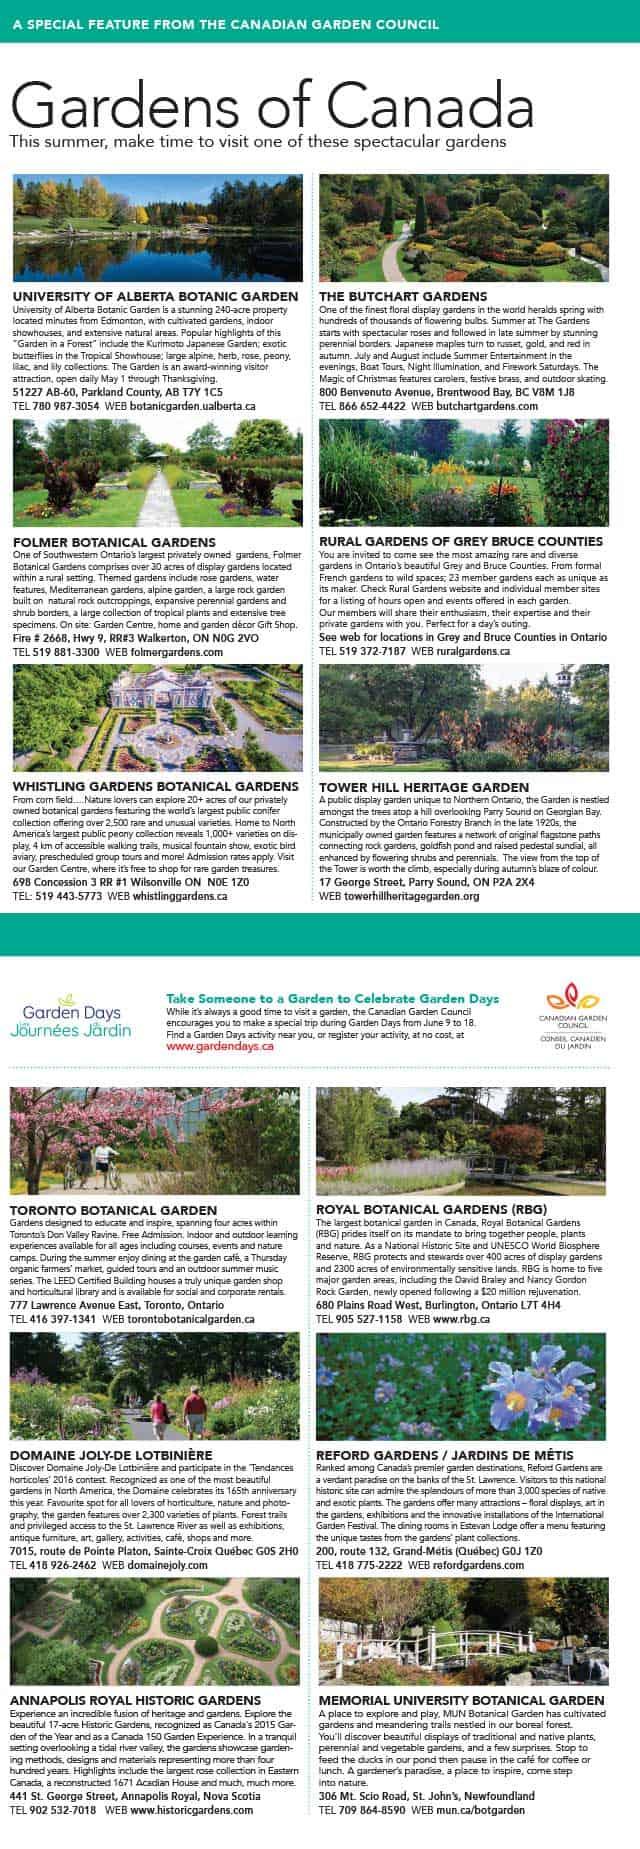 Gardens of Canada 2017